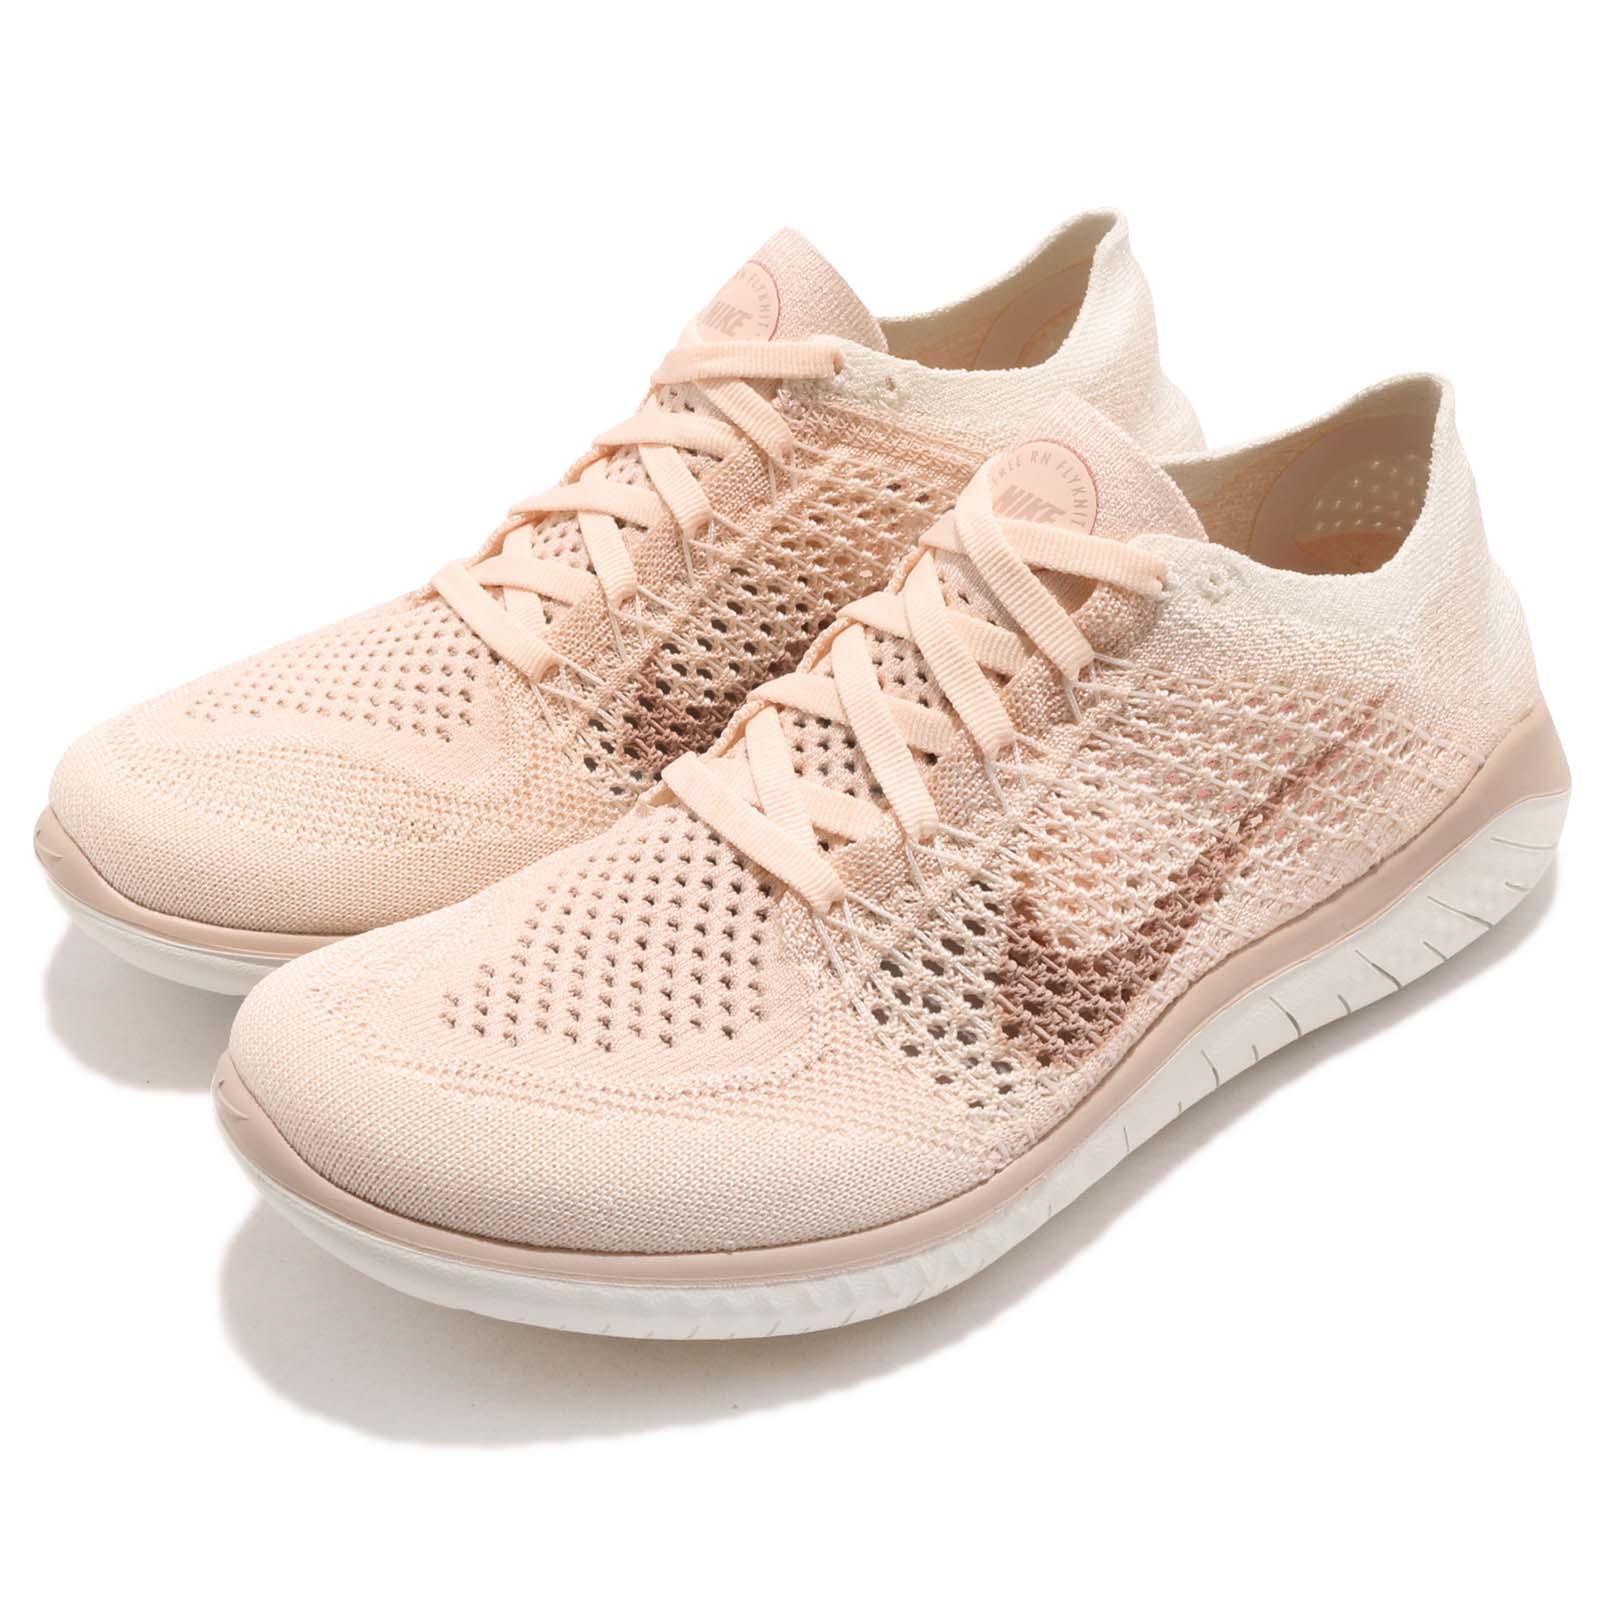 Nike Wmns Free RN Flyknit 2018 Guava Ice Beige mujer mujer mujer Running zapatos 942839-802  precios al por mayor